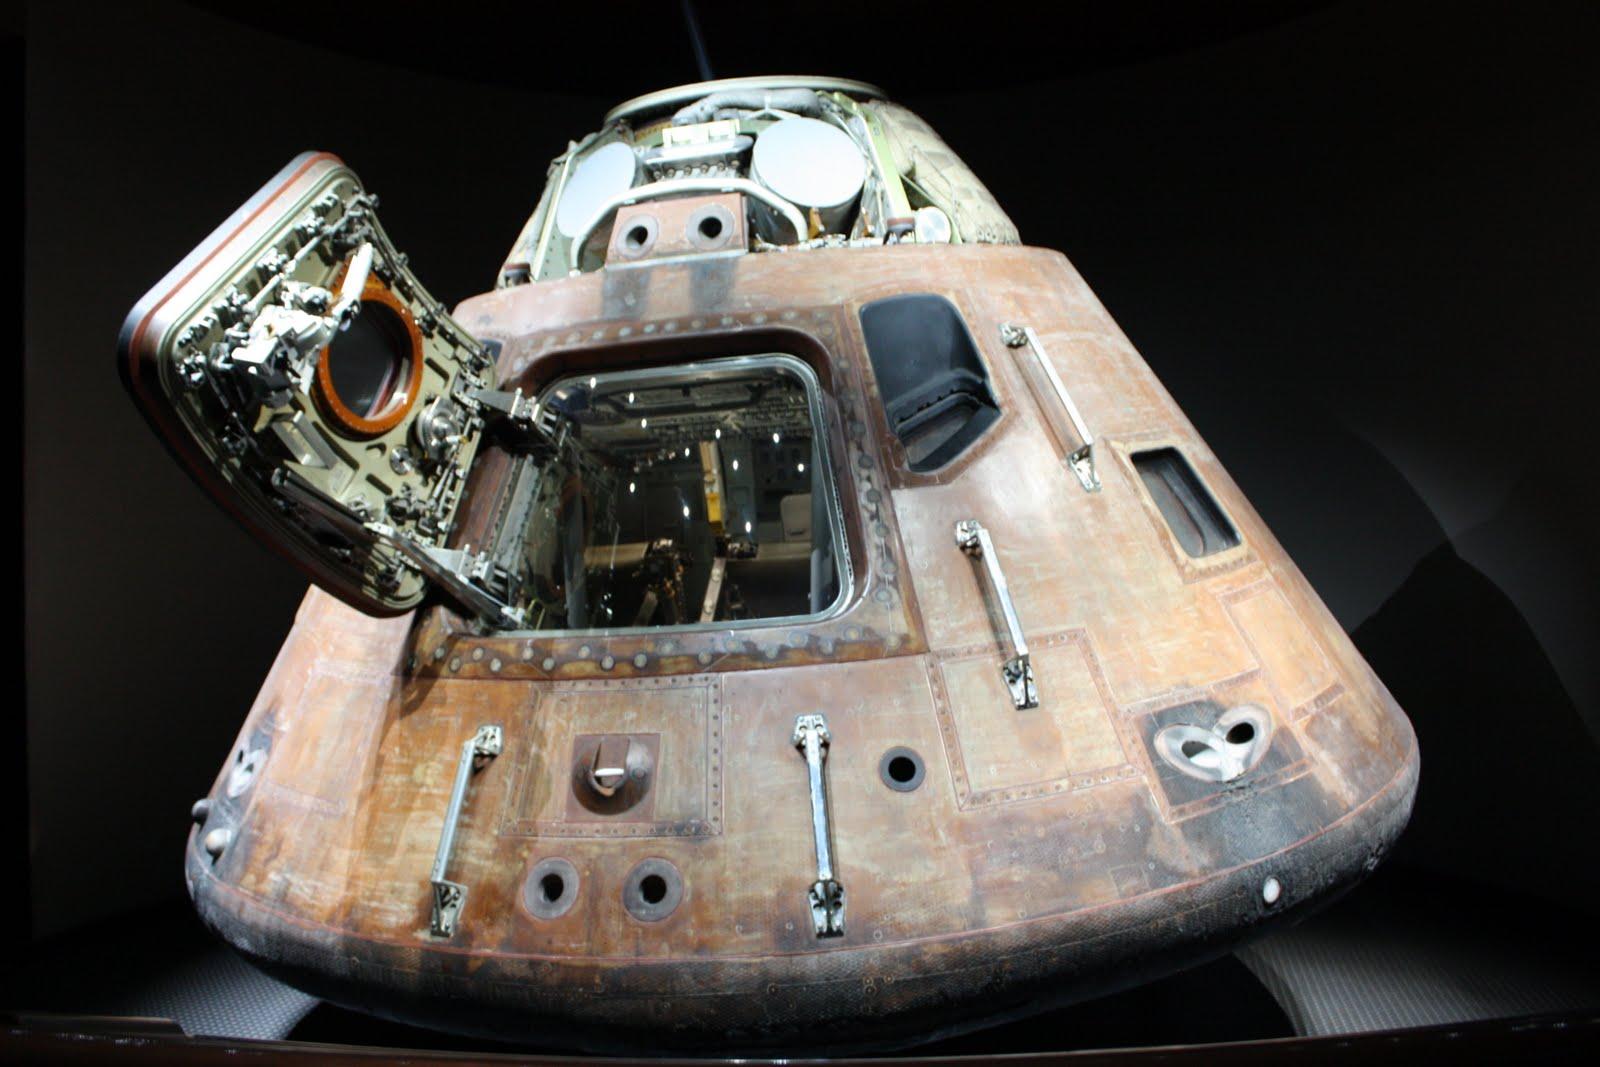 apollo the space shuttle - photo #21